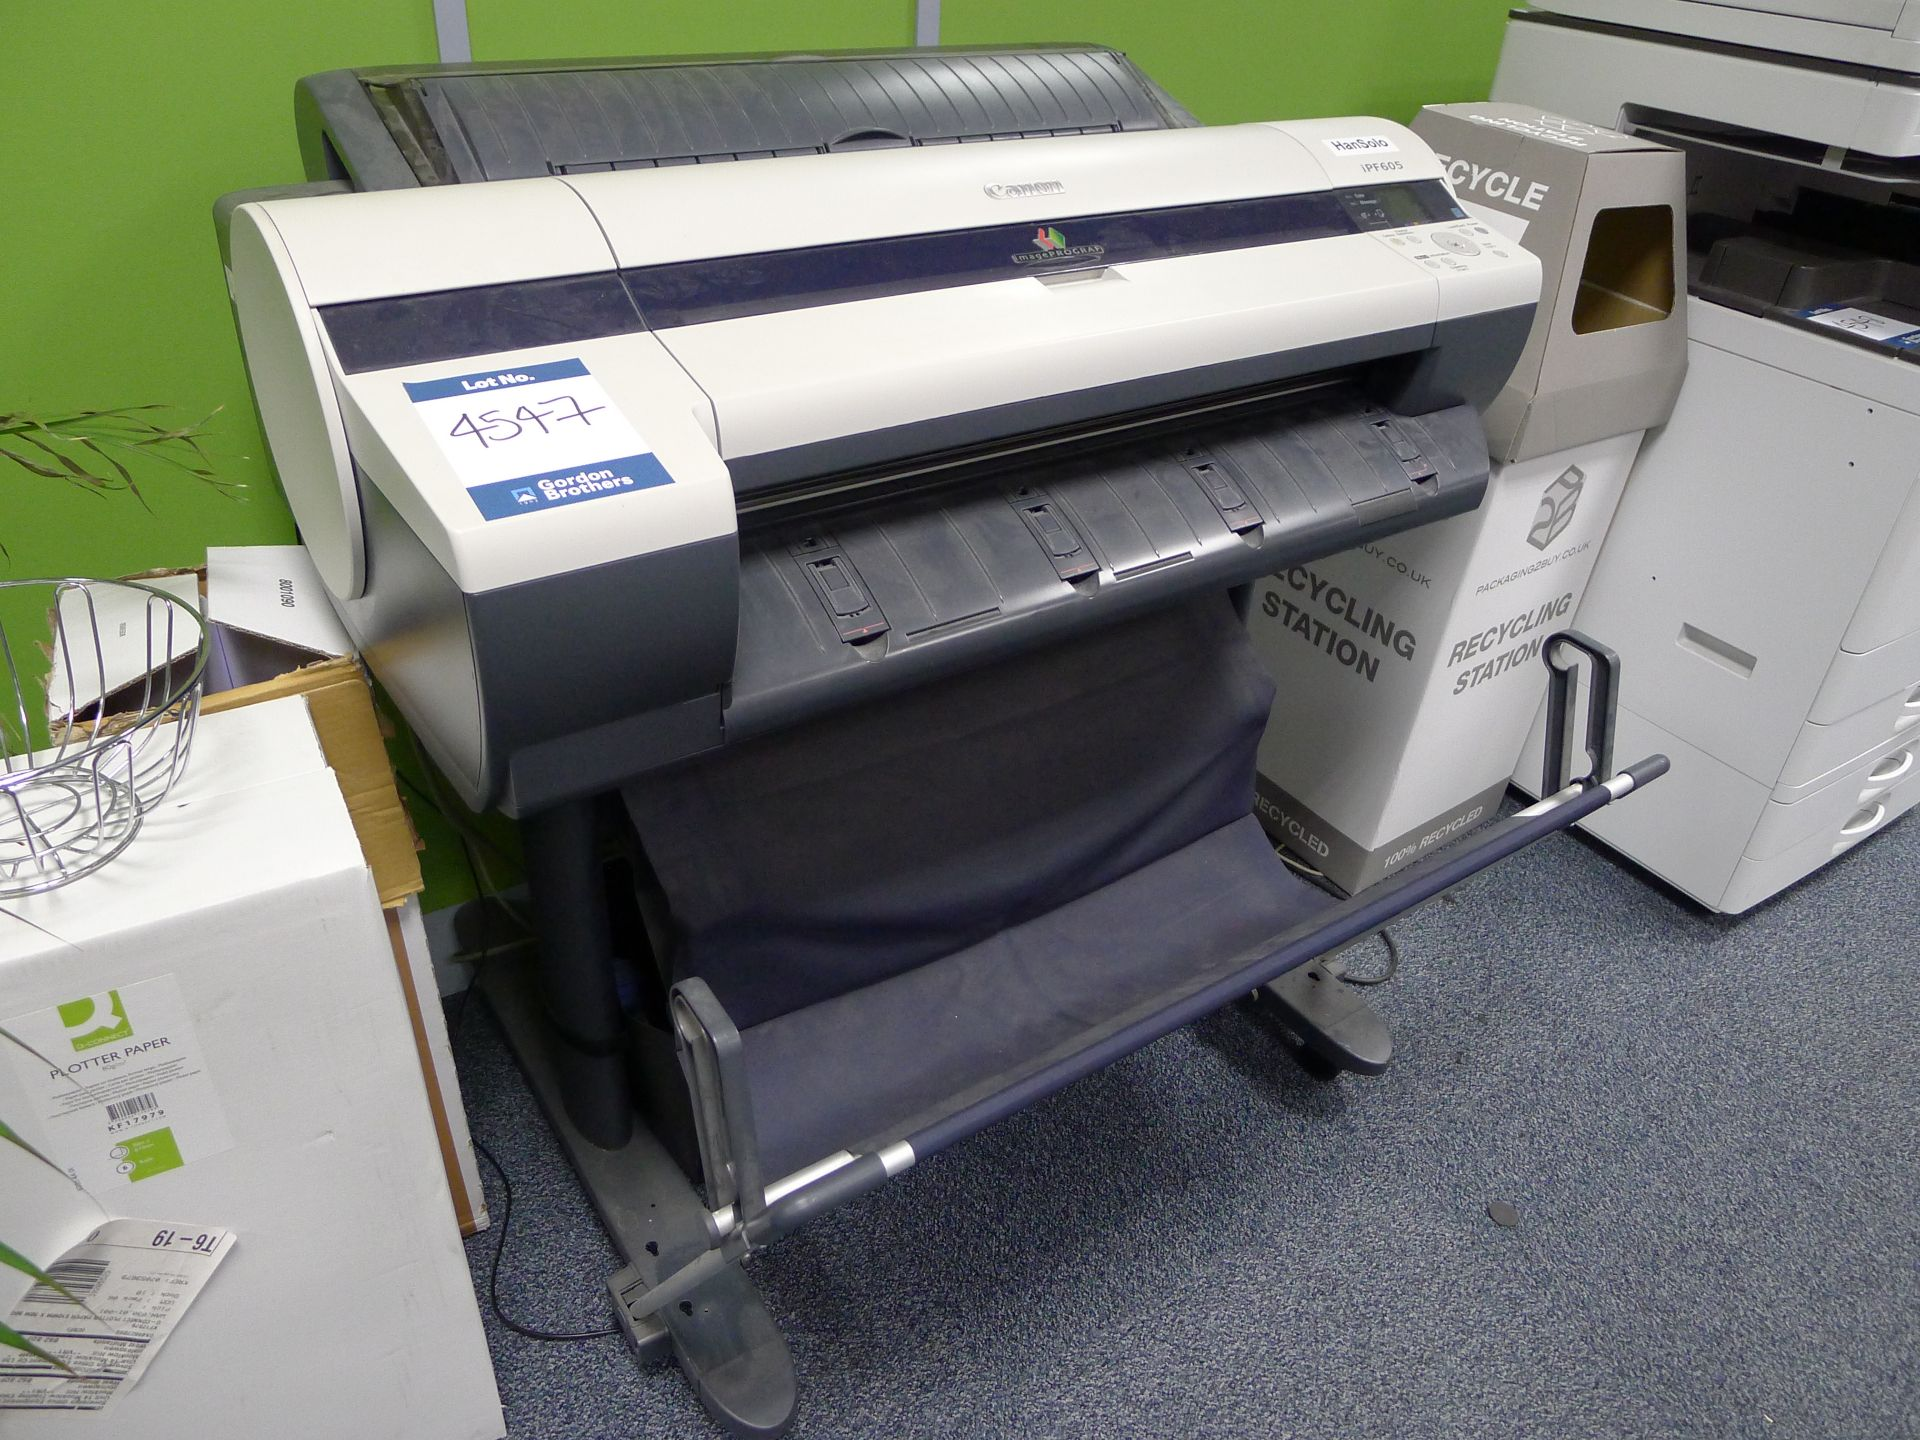 Lot 4547 - Canon Image Prograf IPF605 Wide Format Printer Ser